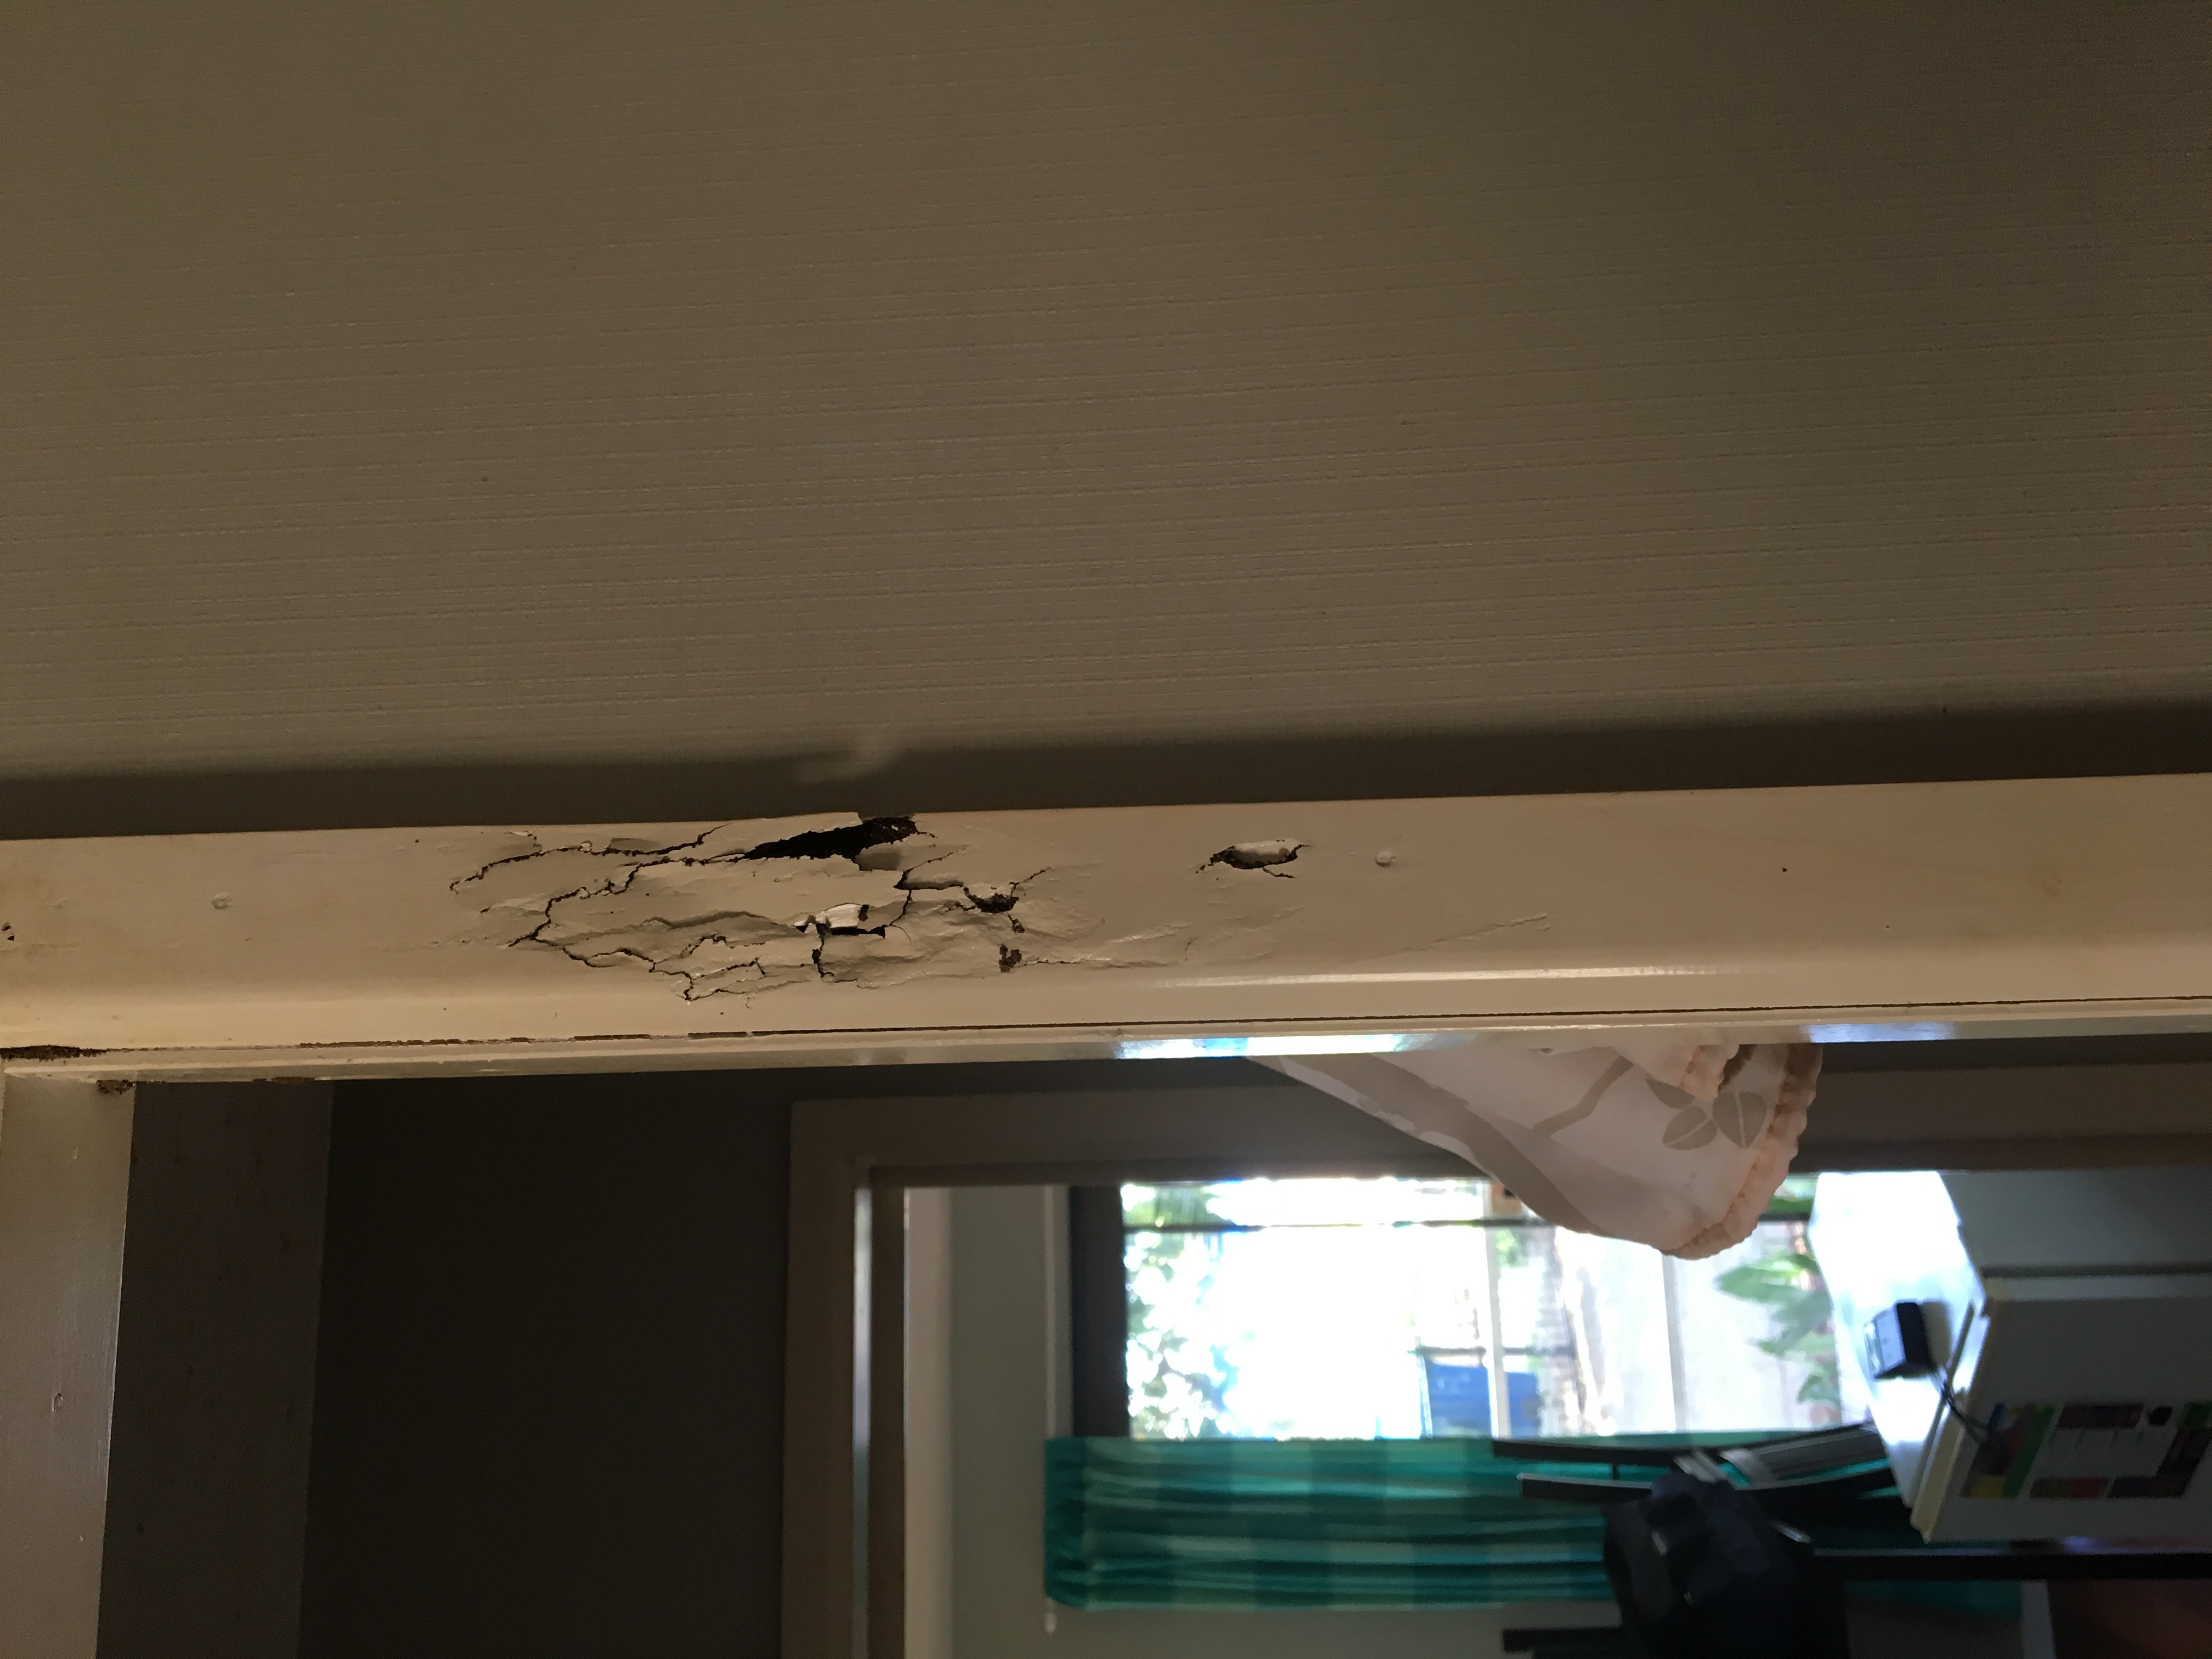 Door frame damage by Termites in Townsville